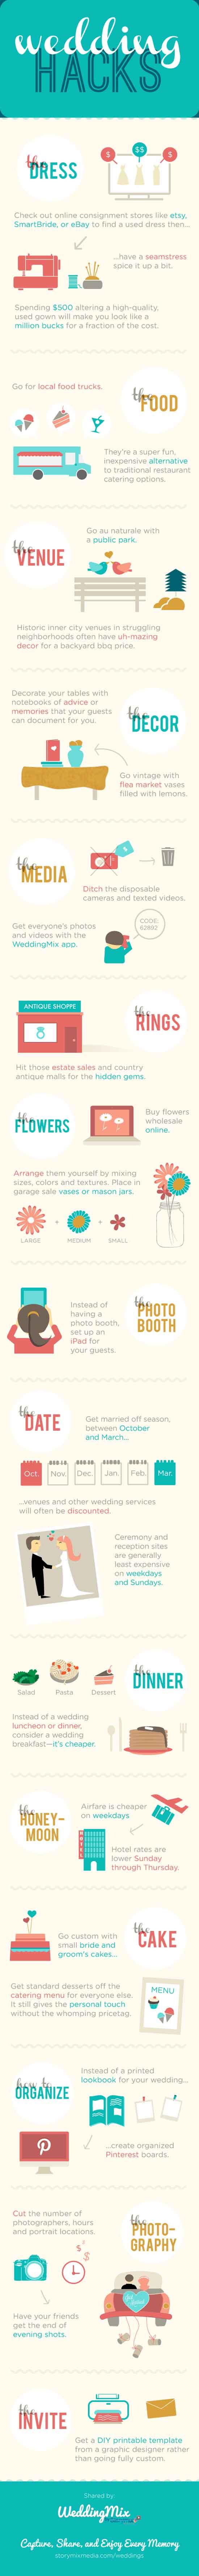 Top DIY Wedding Hacks Infographic @WeddingMix